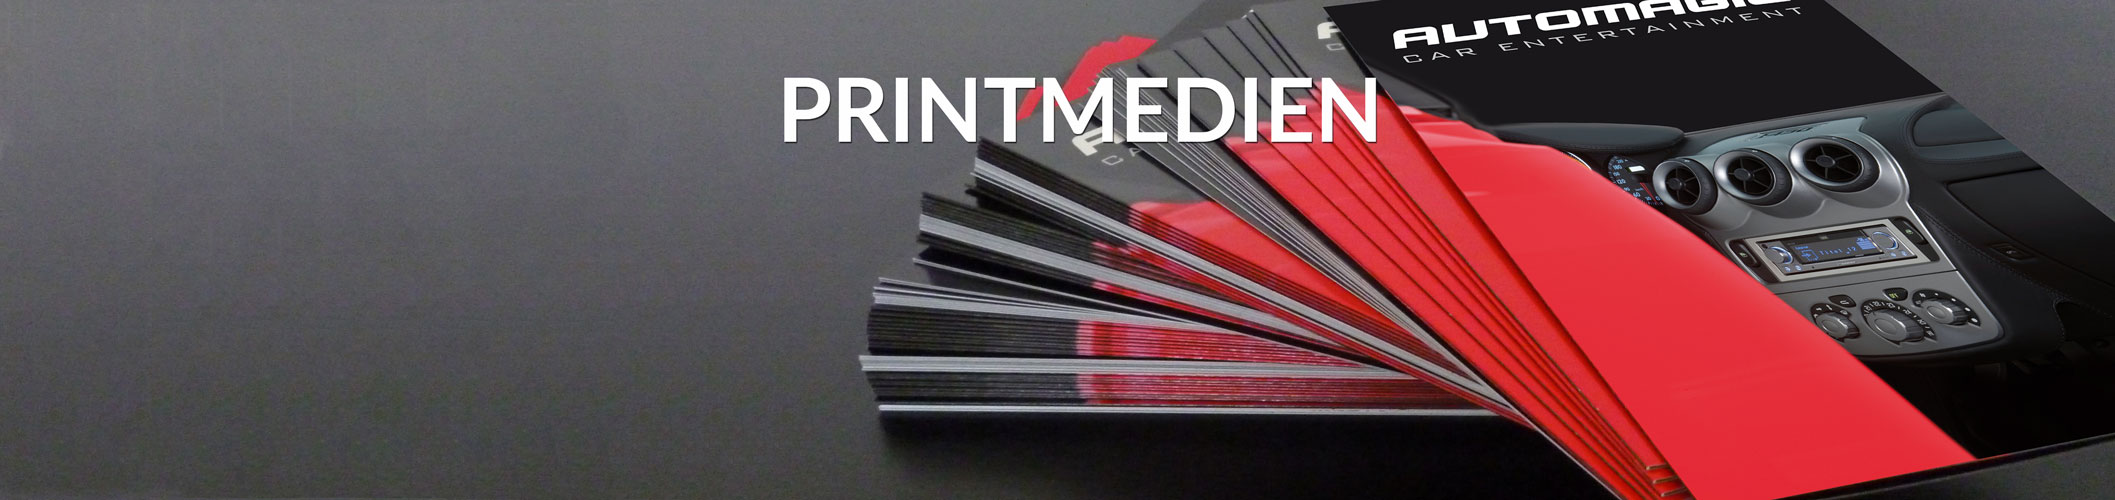 banner-printmedien-am